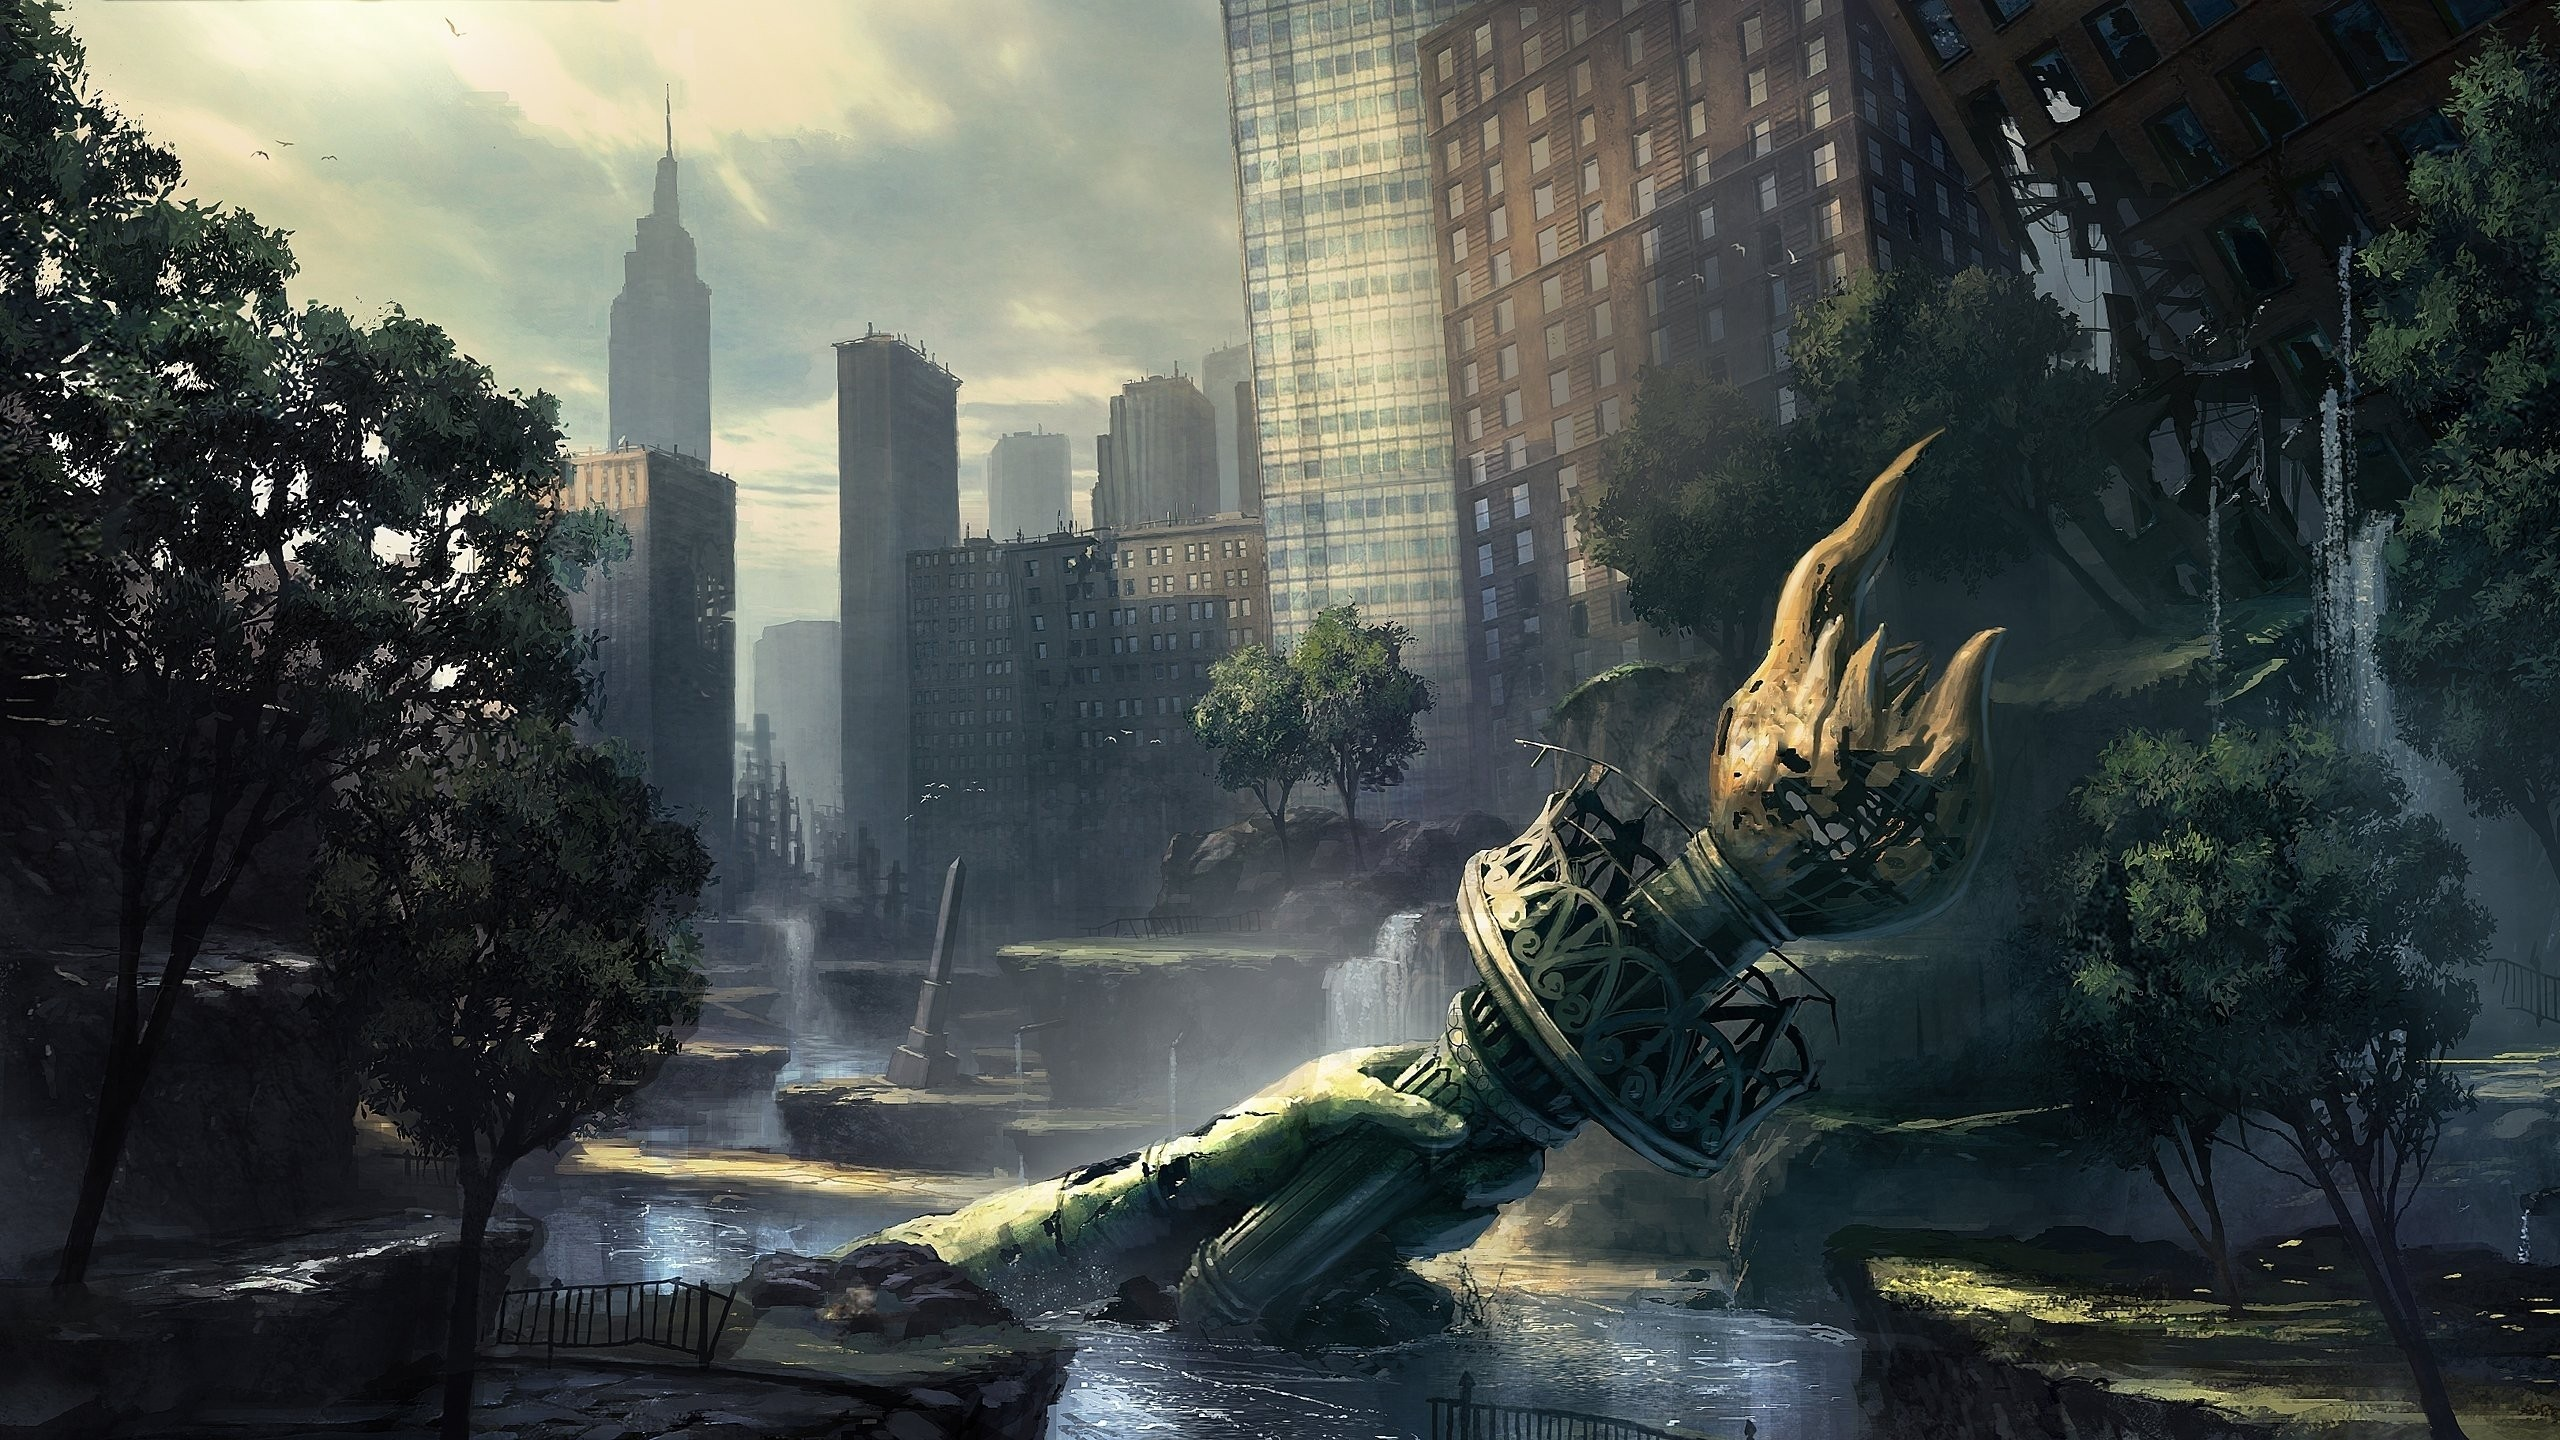 Video games ruins new york city artwork crysis 2 wallpaper